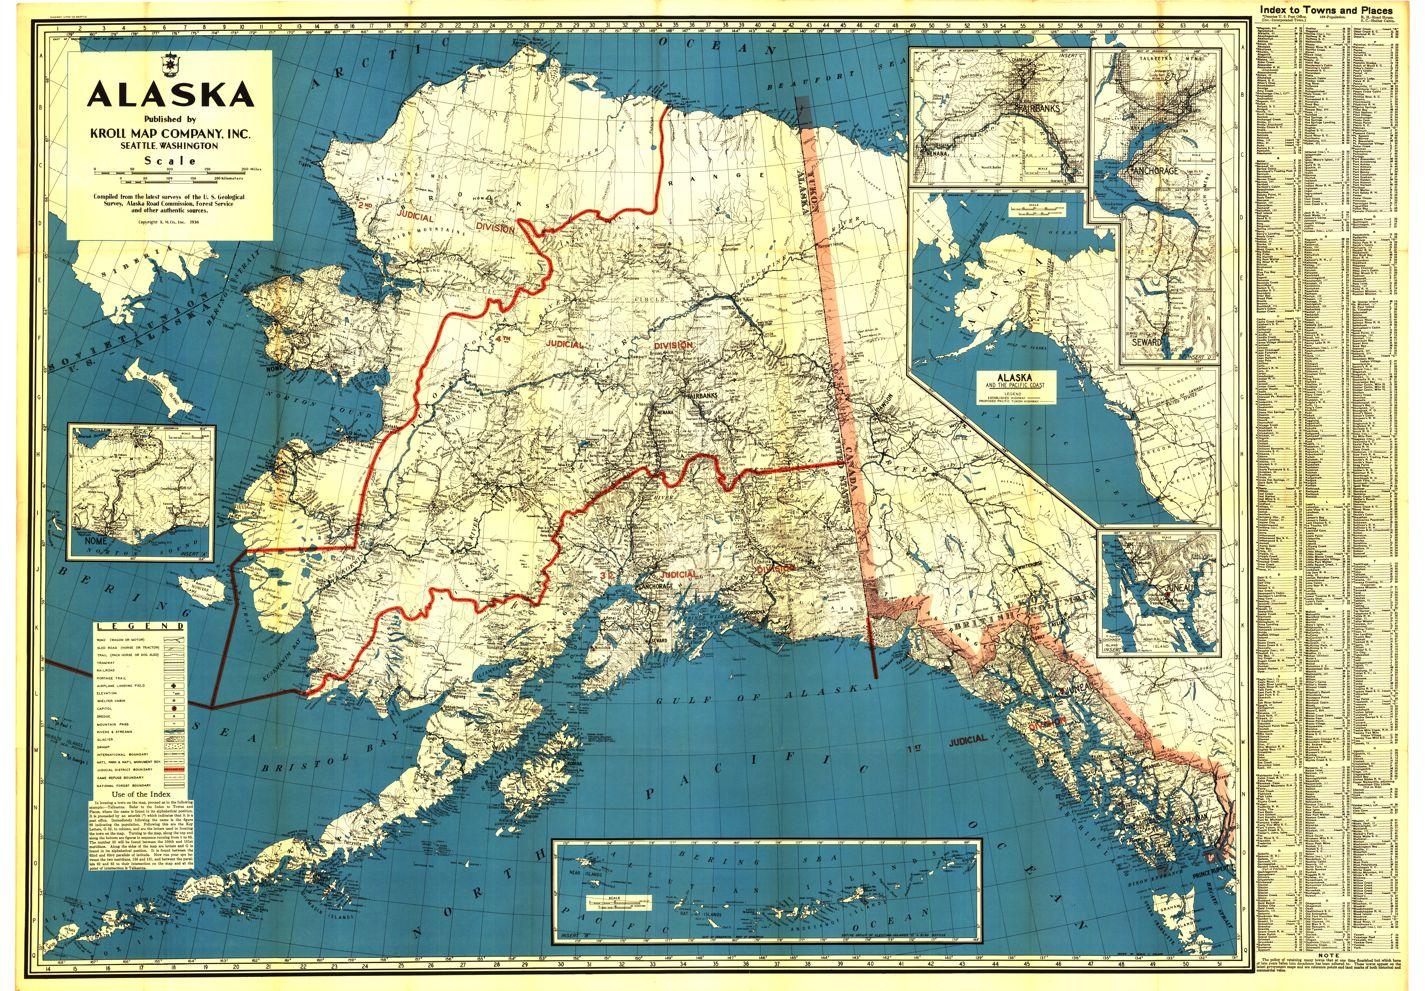 Alaska Historical Maps Kroll Map Company - Maps alaska